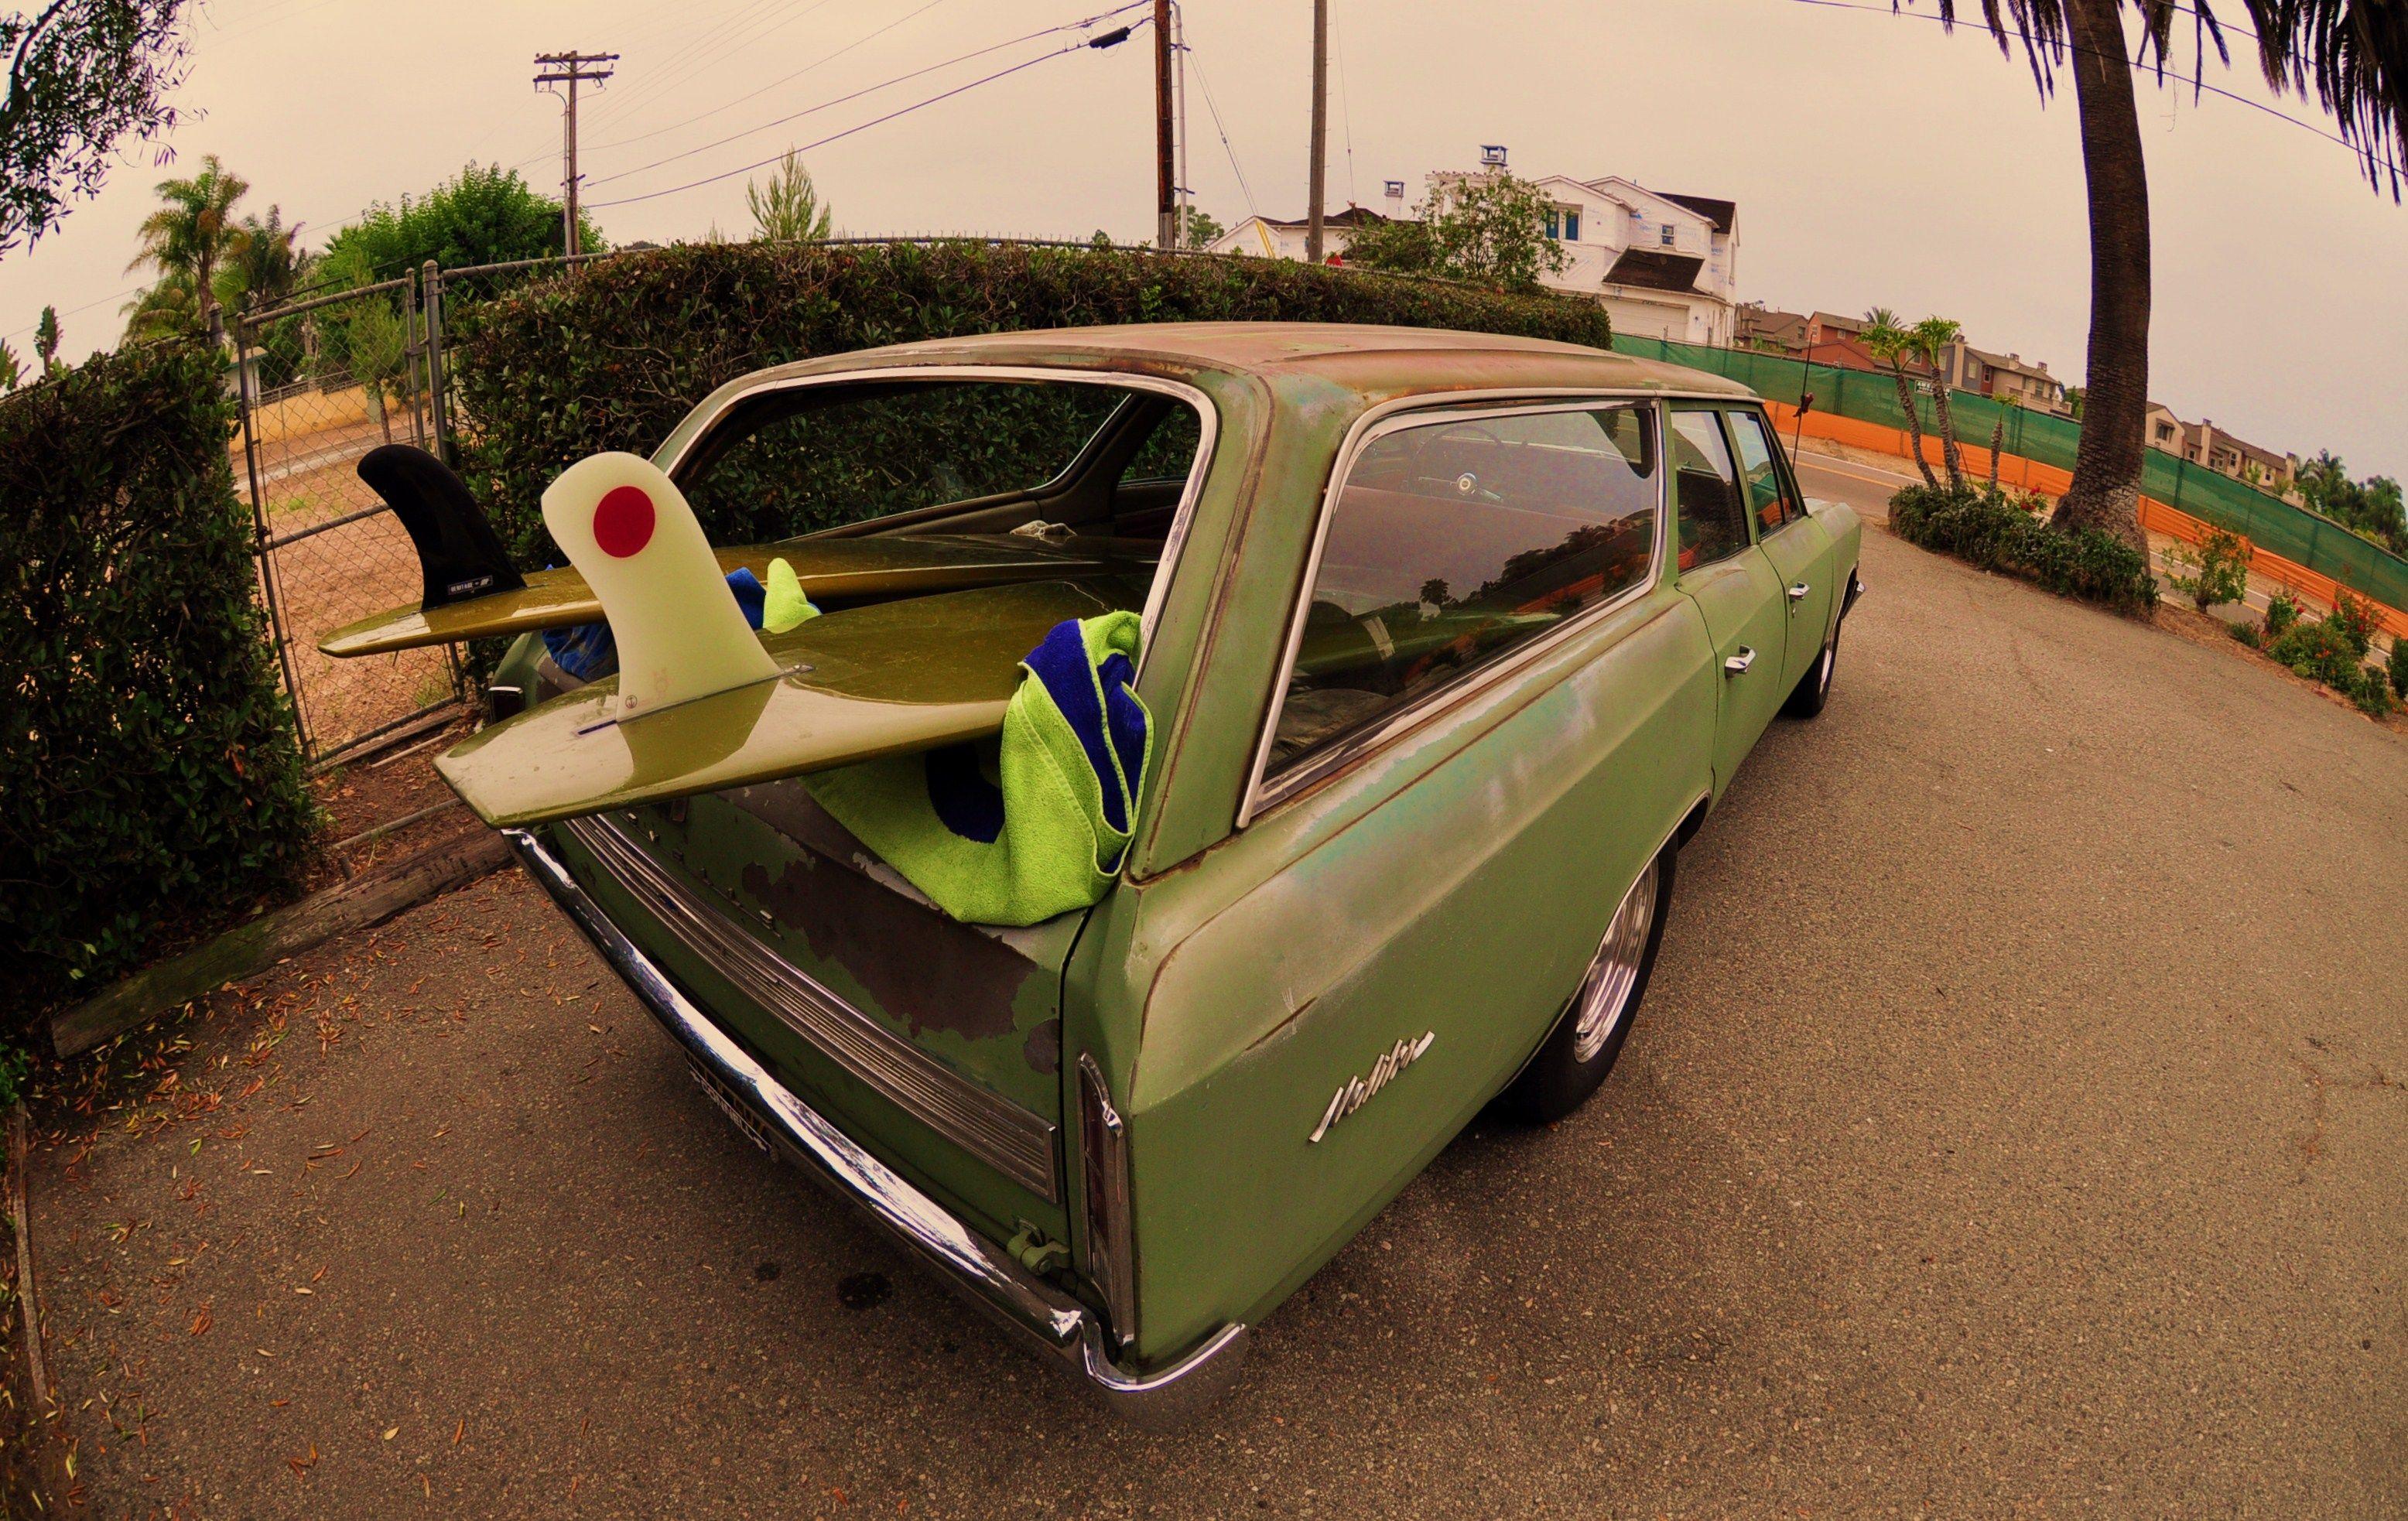 66 chevy chevelle malibu wagon aka surf wagon